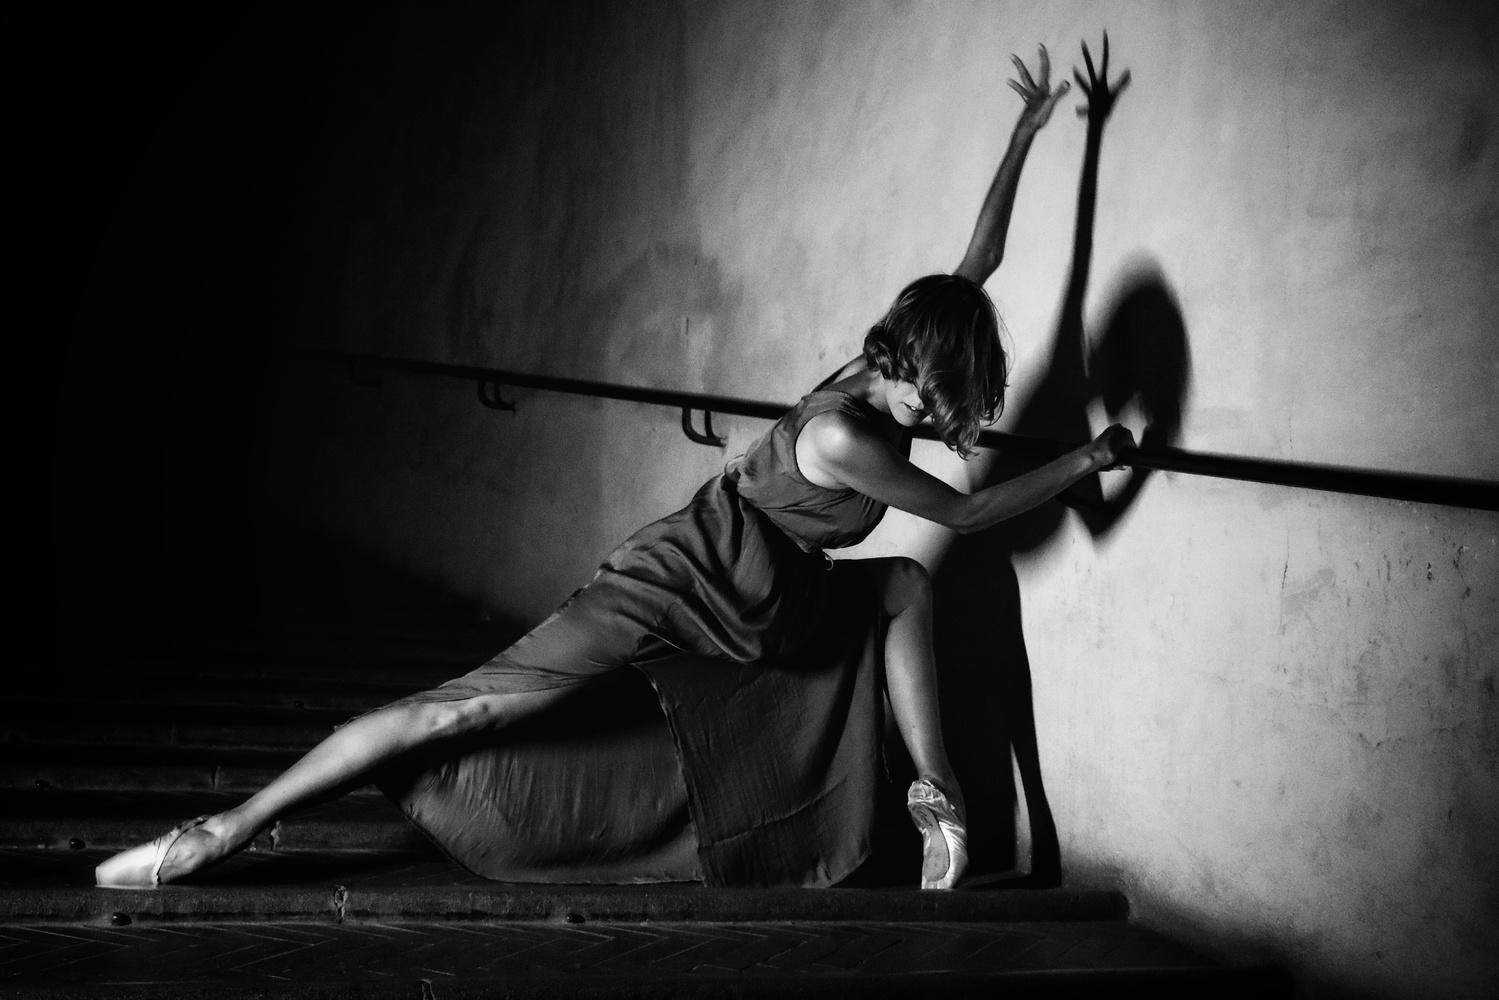 Dance#1 by Alberto Sorge